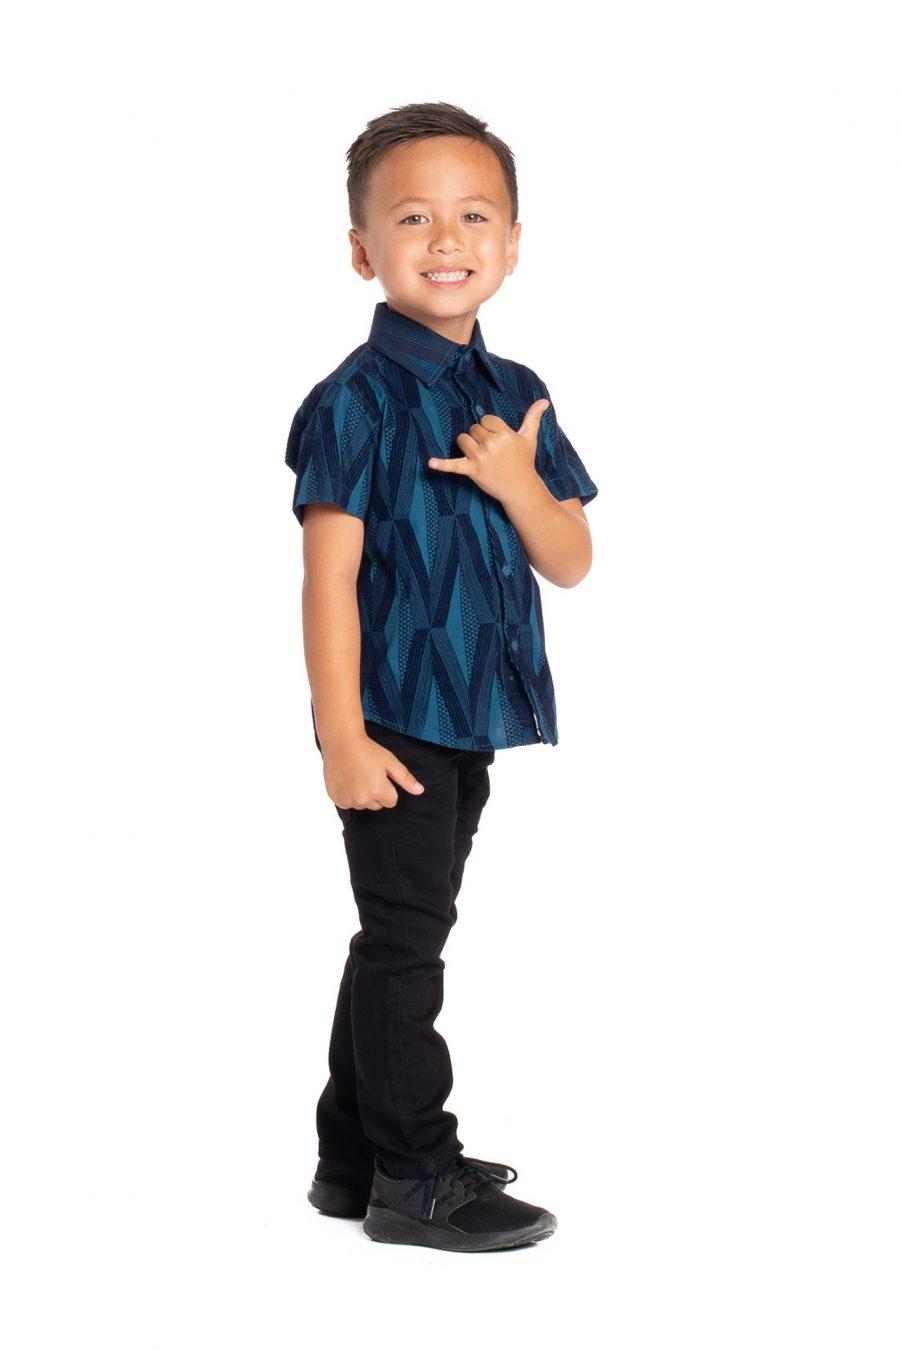 Boy wearing Keiki Aloha Short Sleeve in Teal Kanaloa - Side View